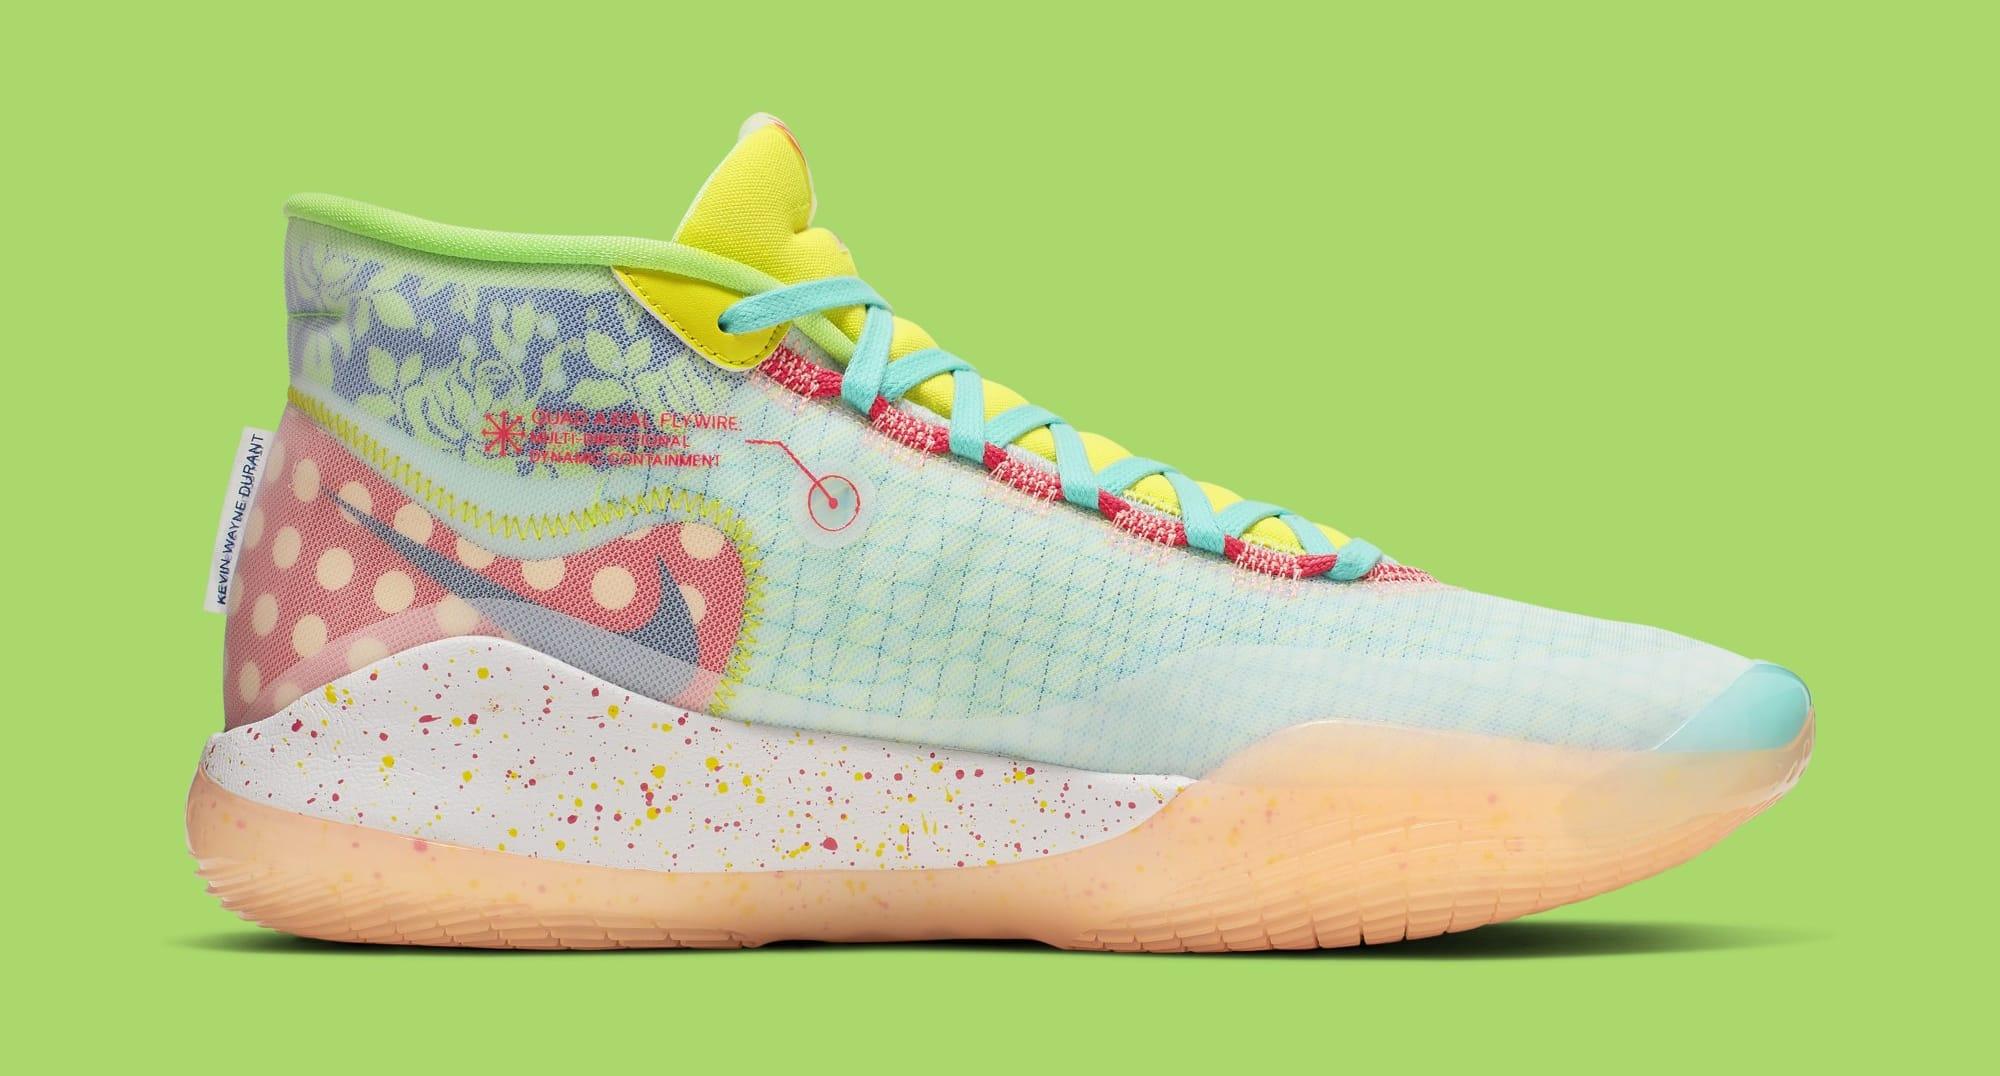 Nike KD 12 'EYBL' CK1195-300 (Medial)